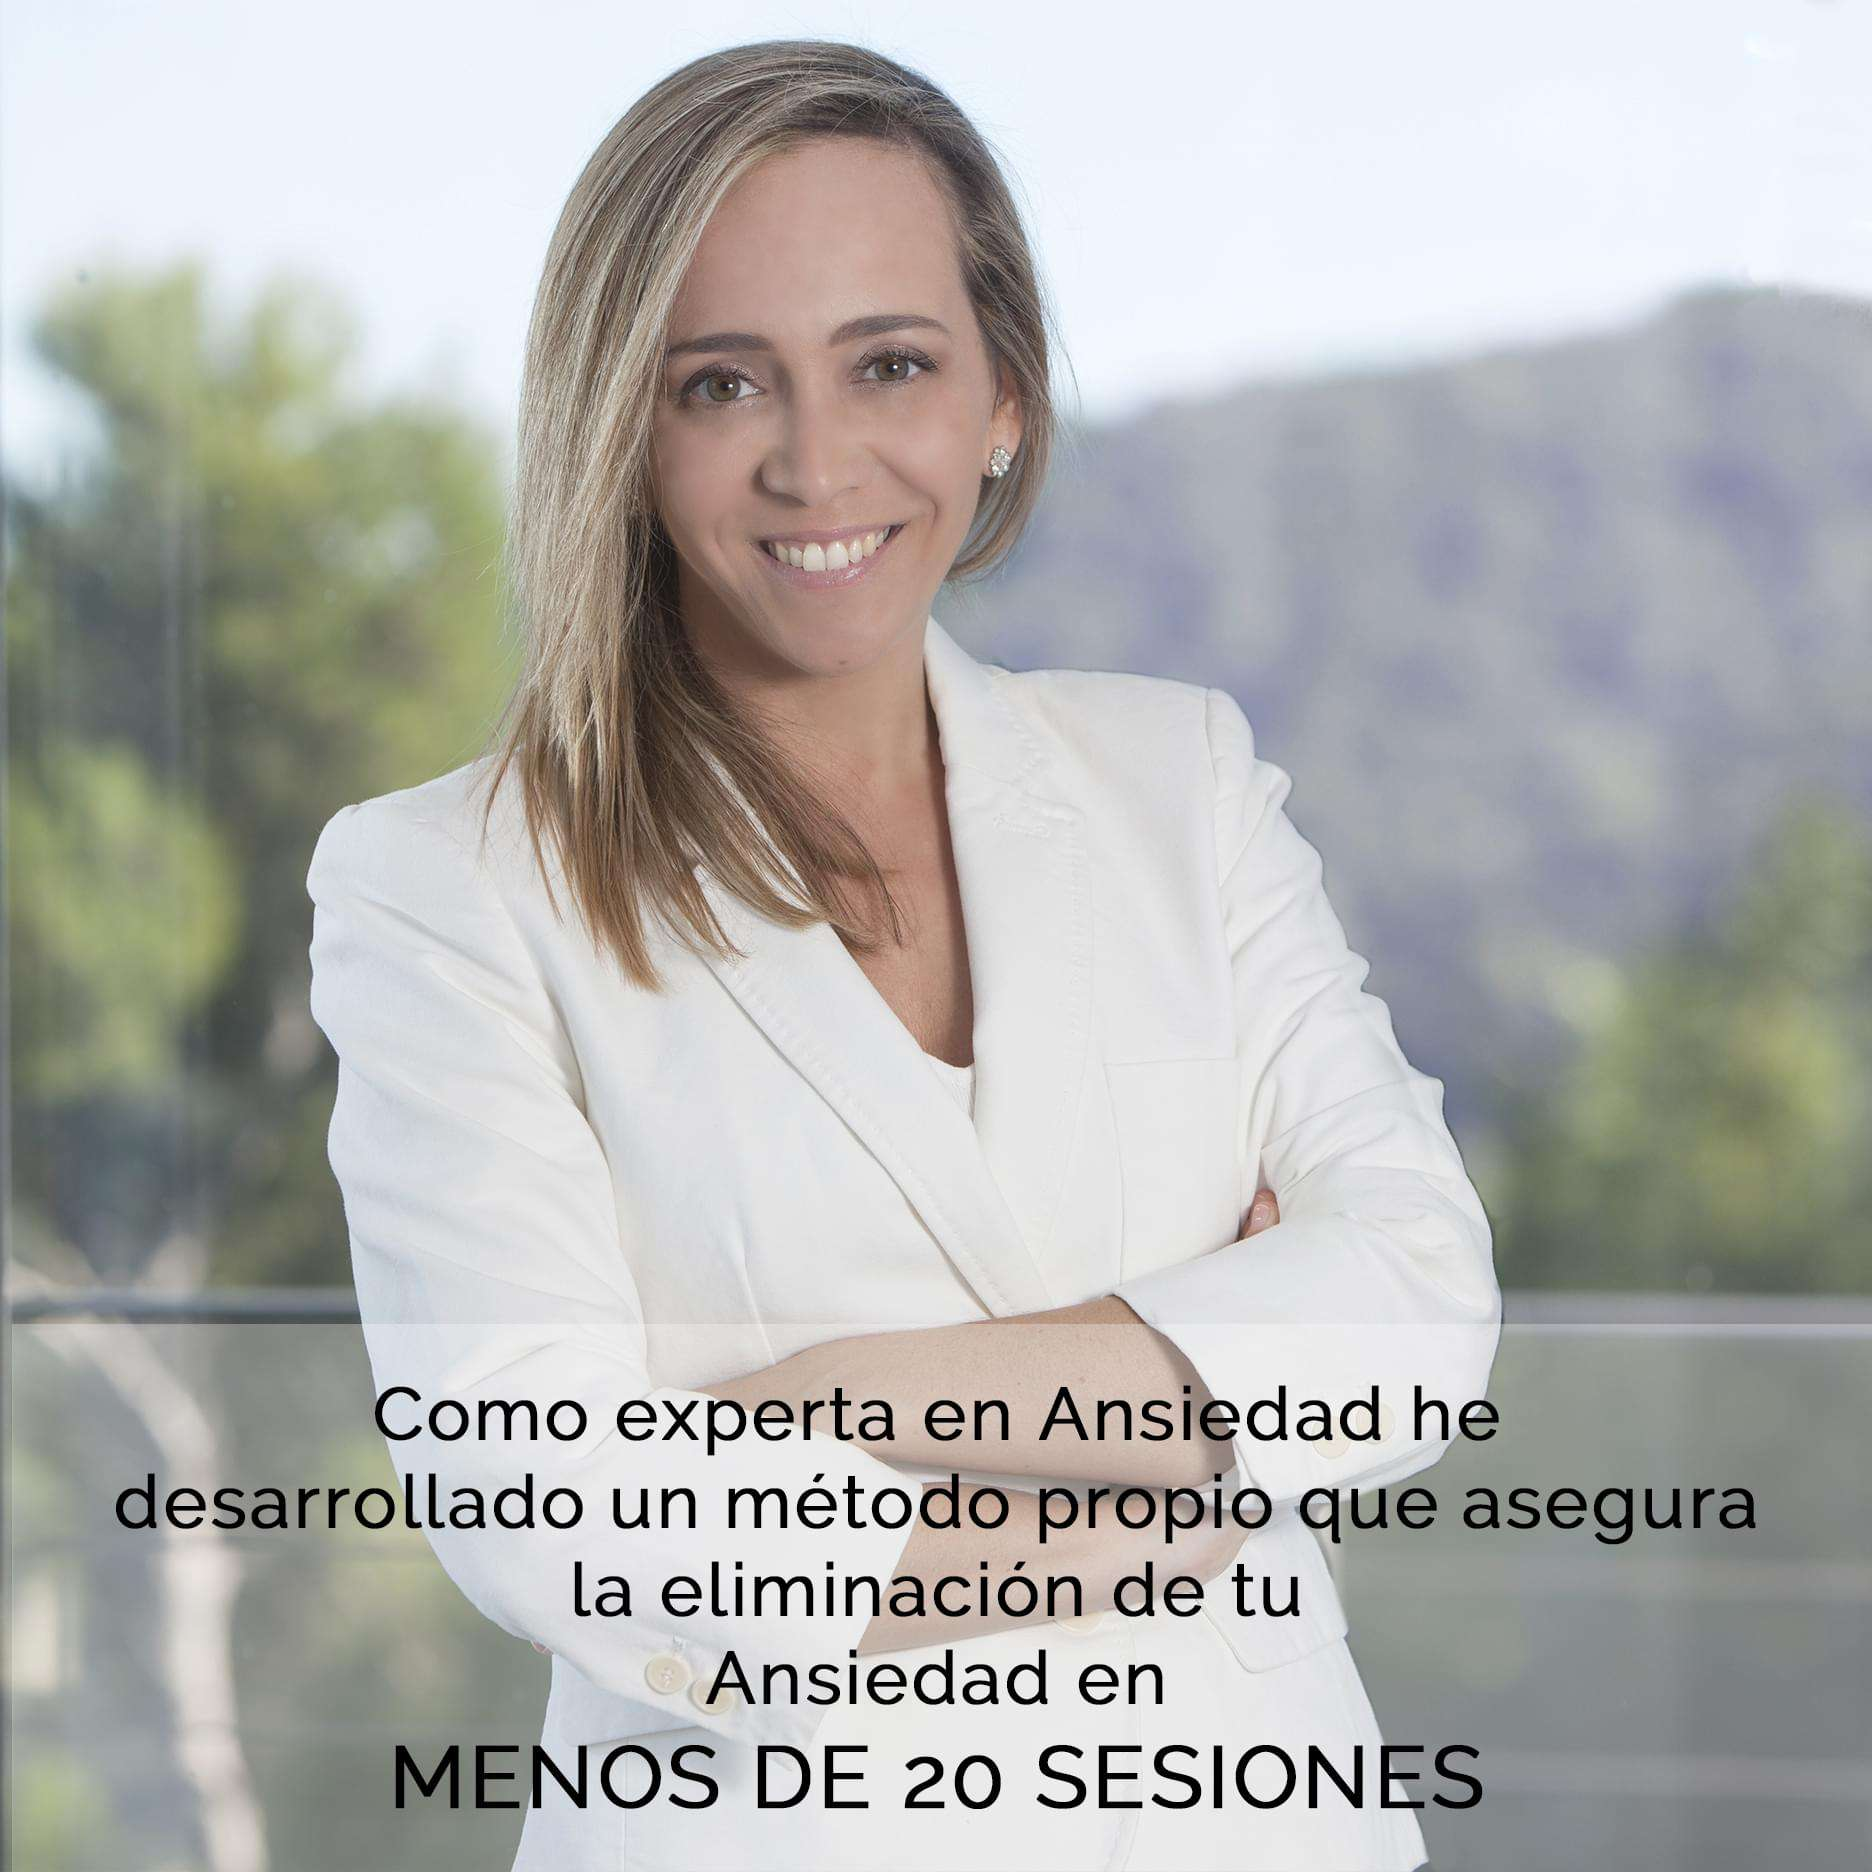 Psicóloga Ansiedad